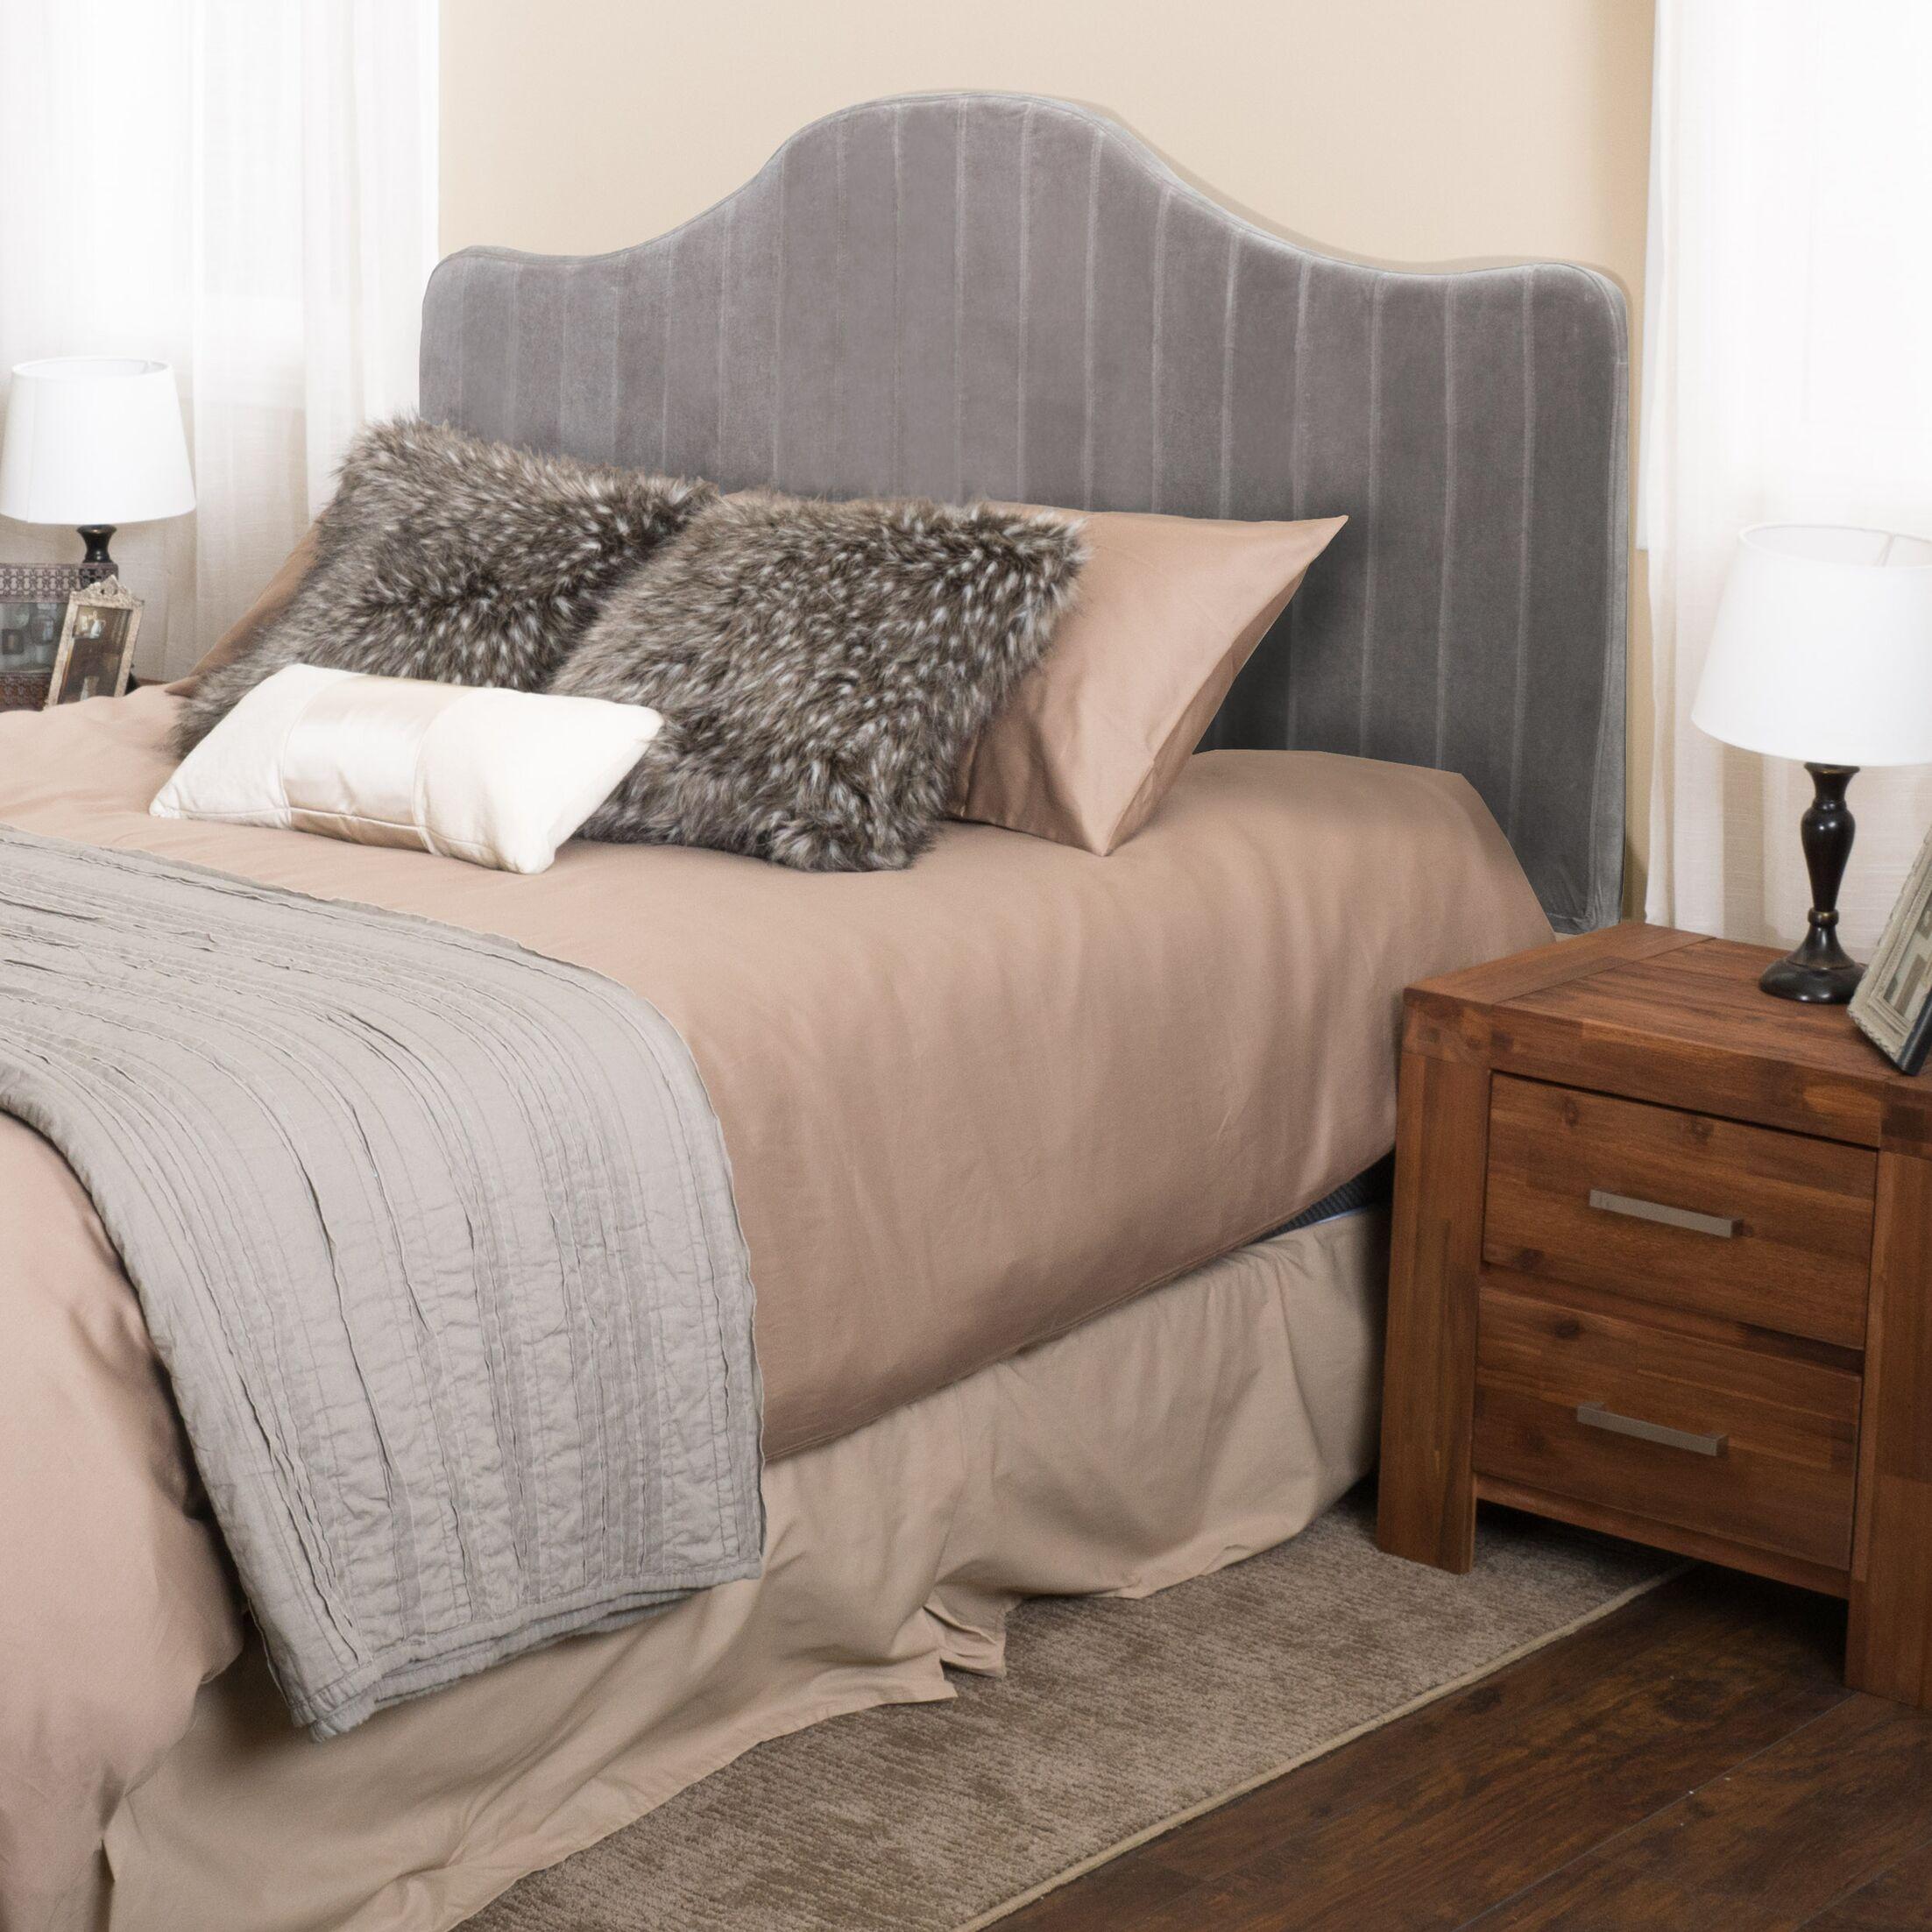 Ashland King Upholstered Panel Headboard Upholstery: Grey